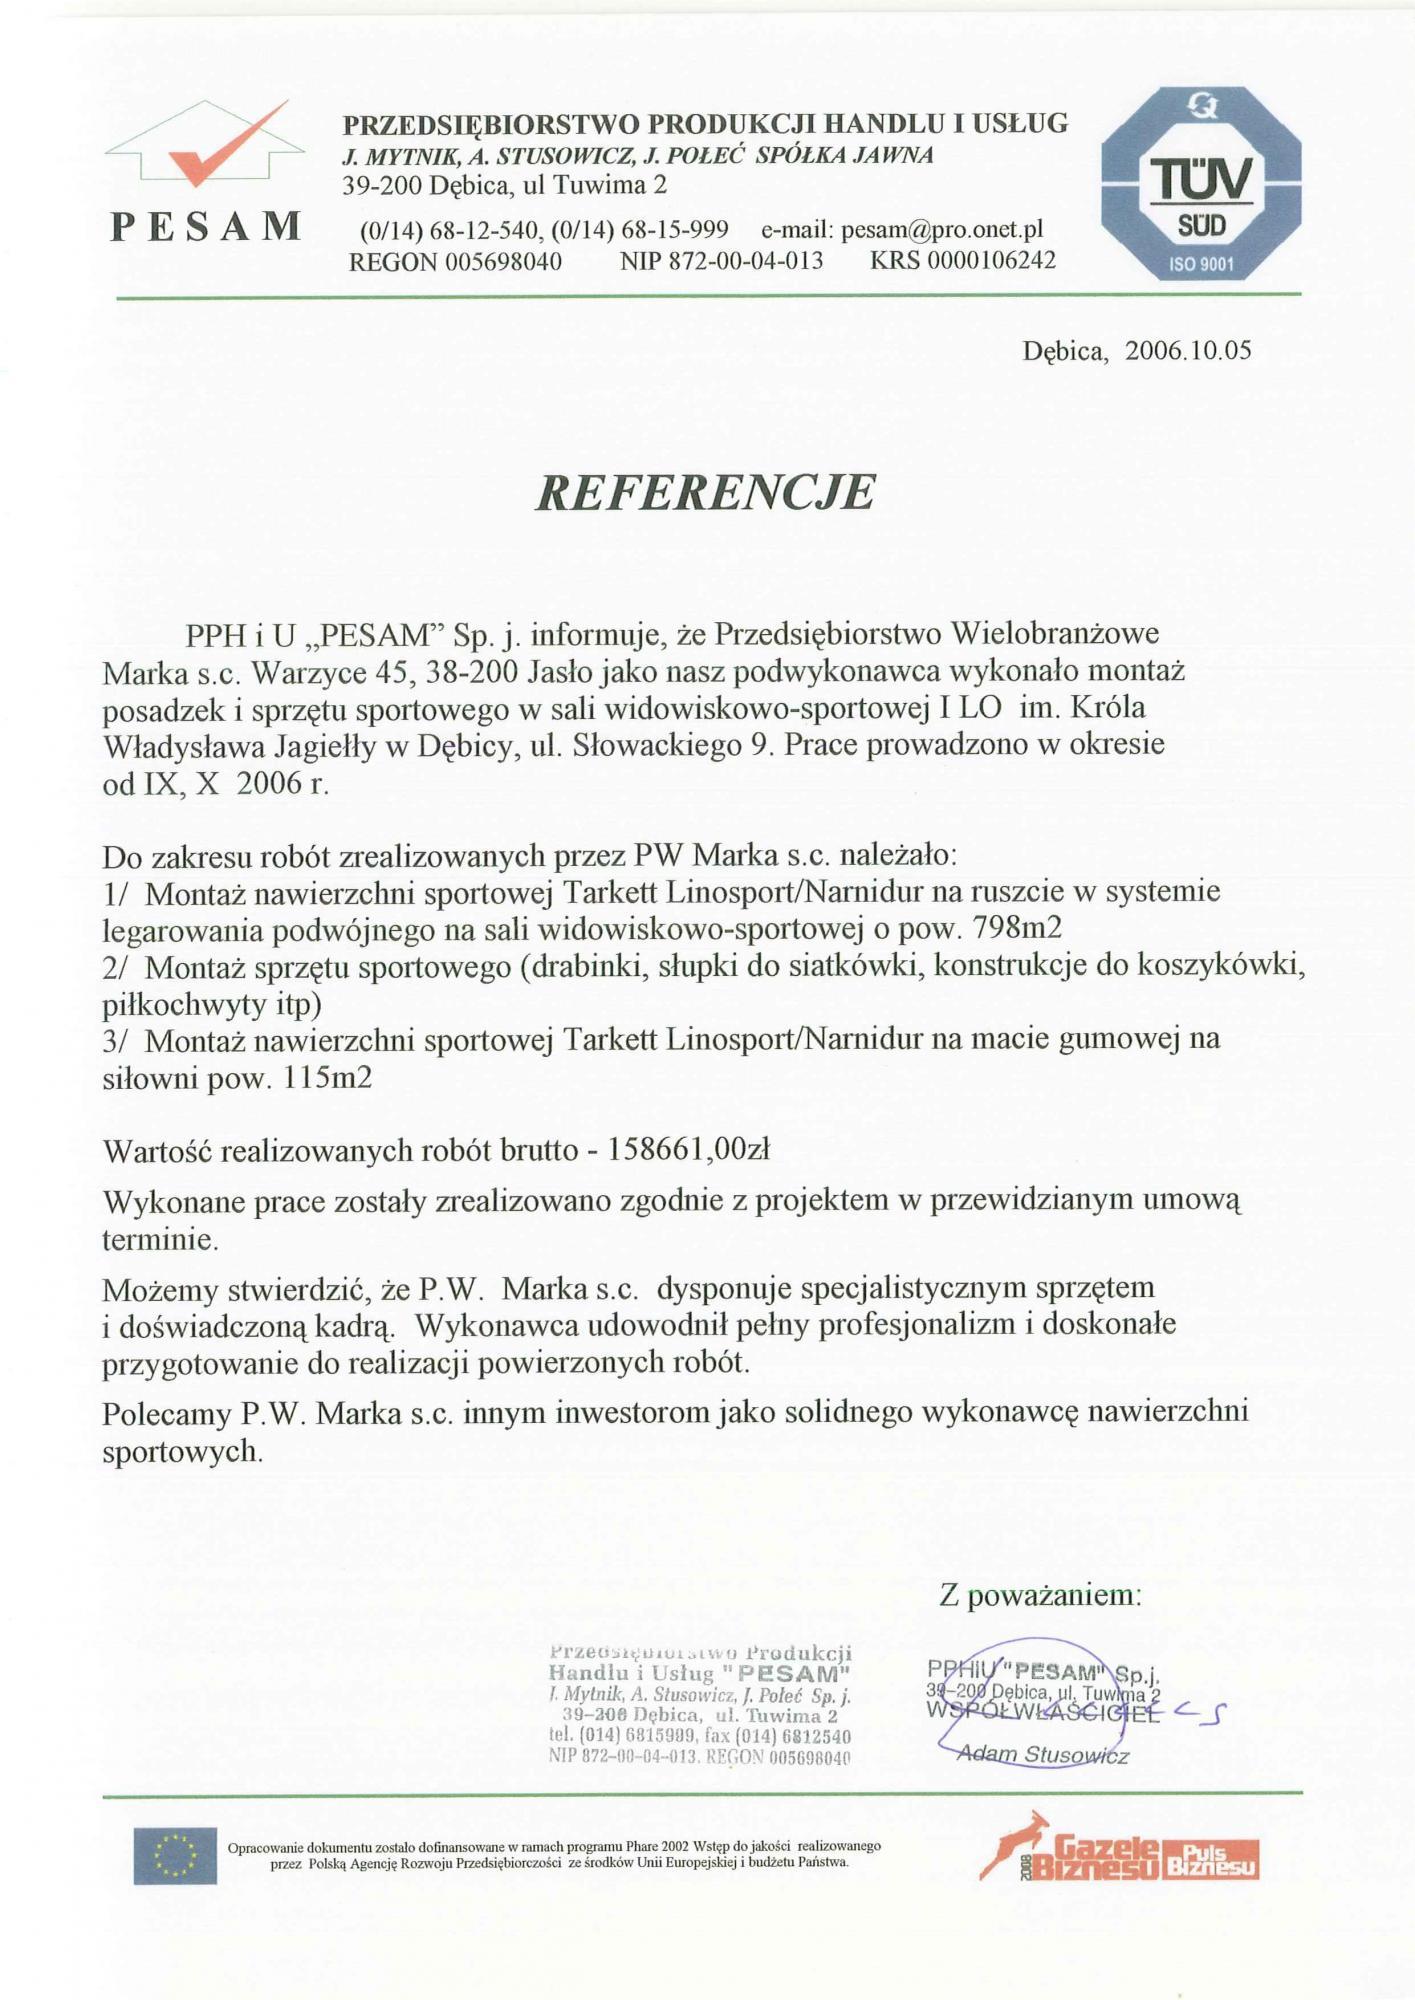 Referencje Pesam 2006